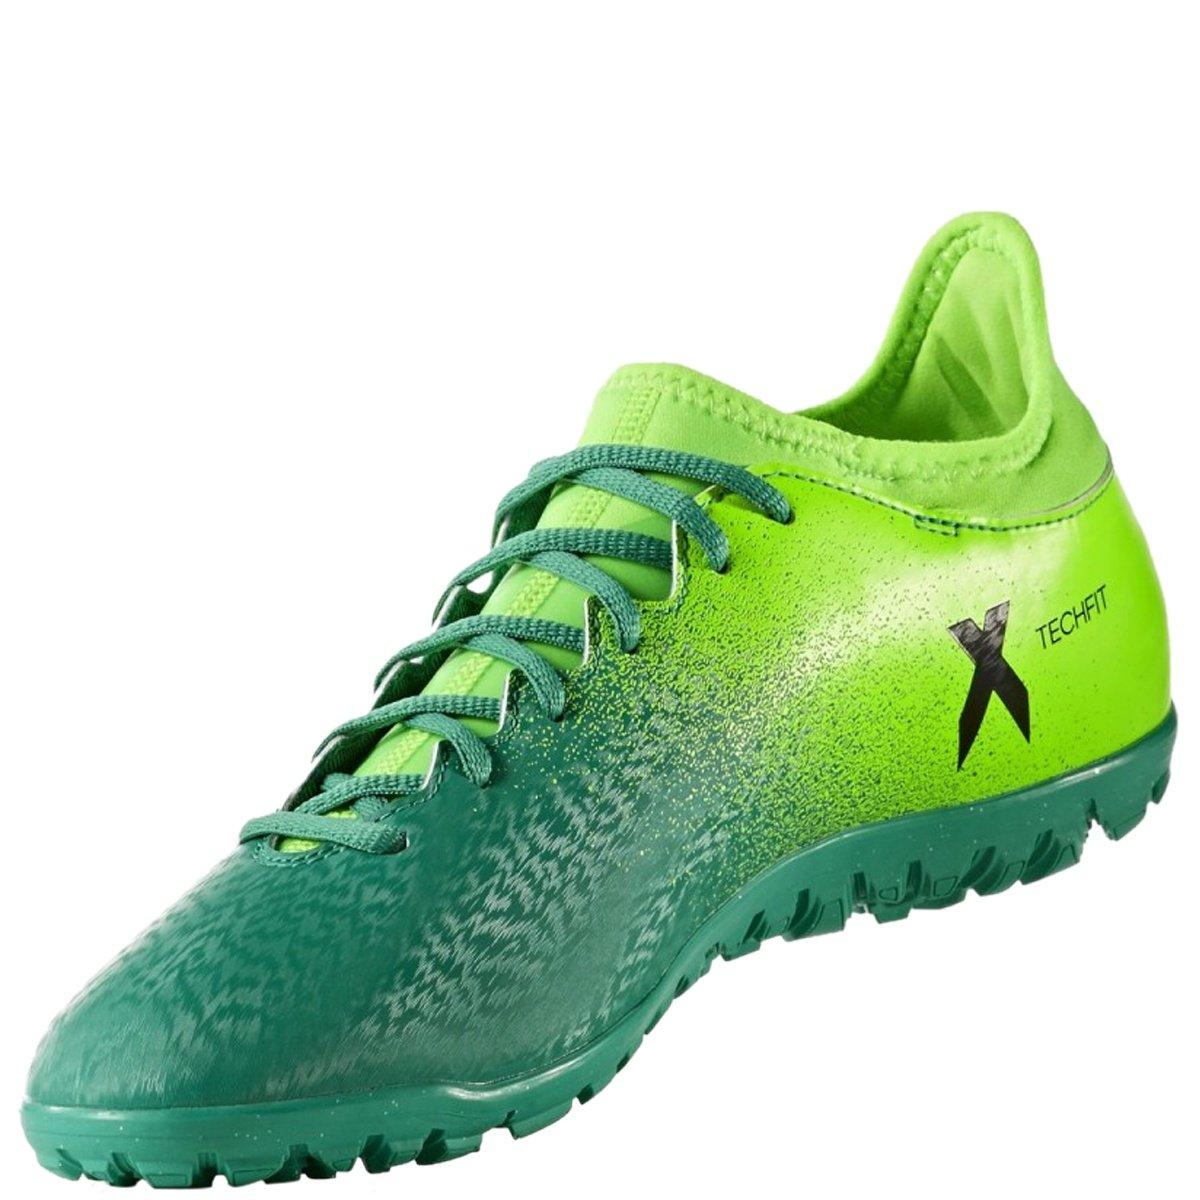 Bizz Store - Chuteira Society Adidas X 16.3 TF Masculina Verde dccc937d545c0